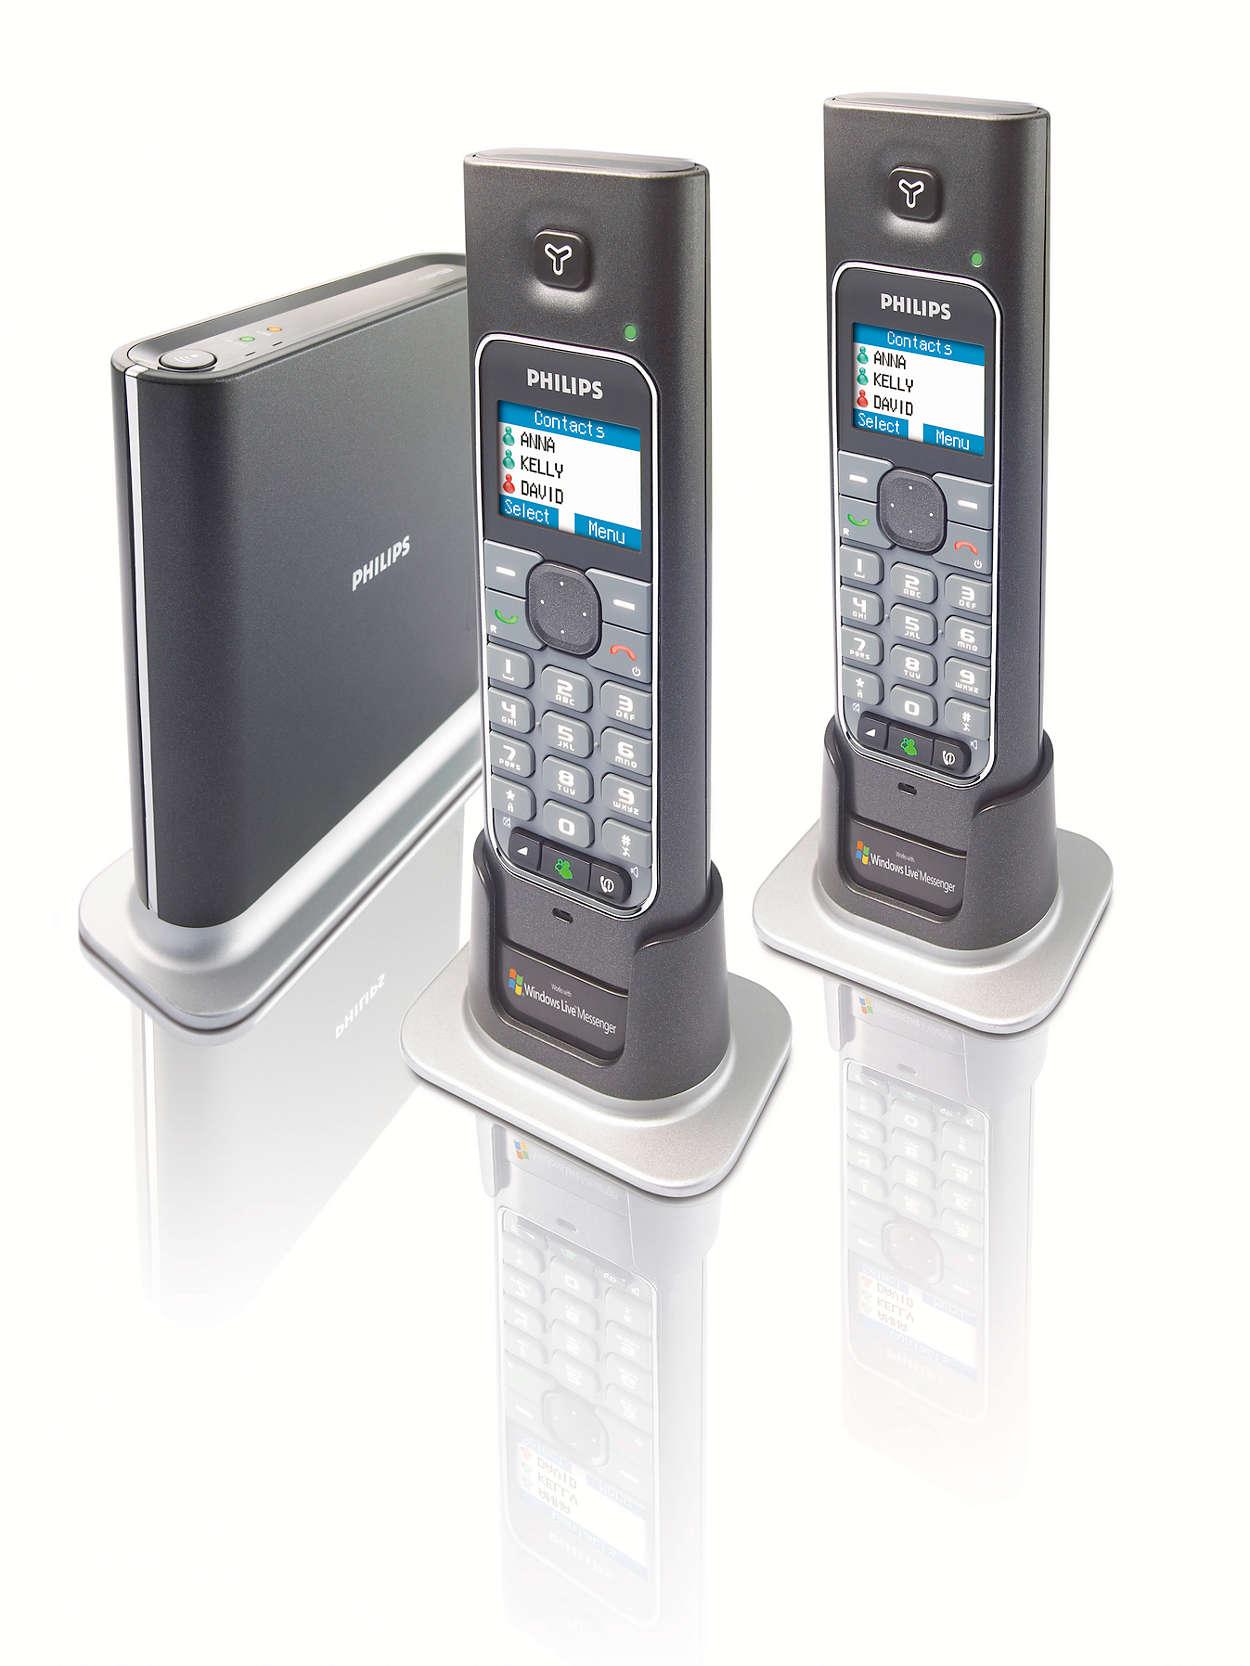 FREE worldwide Internet calls*